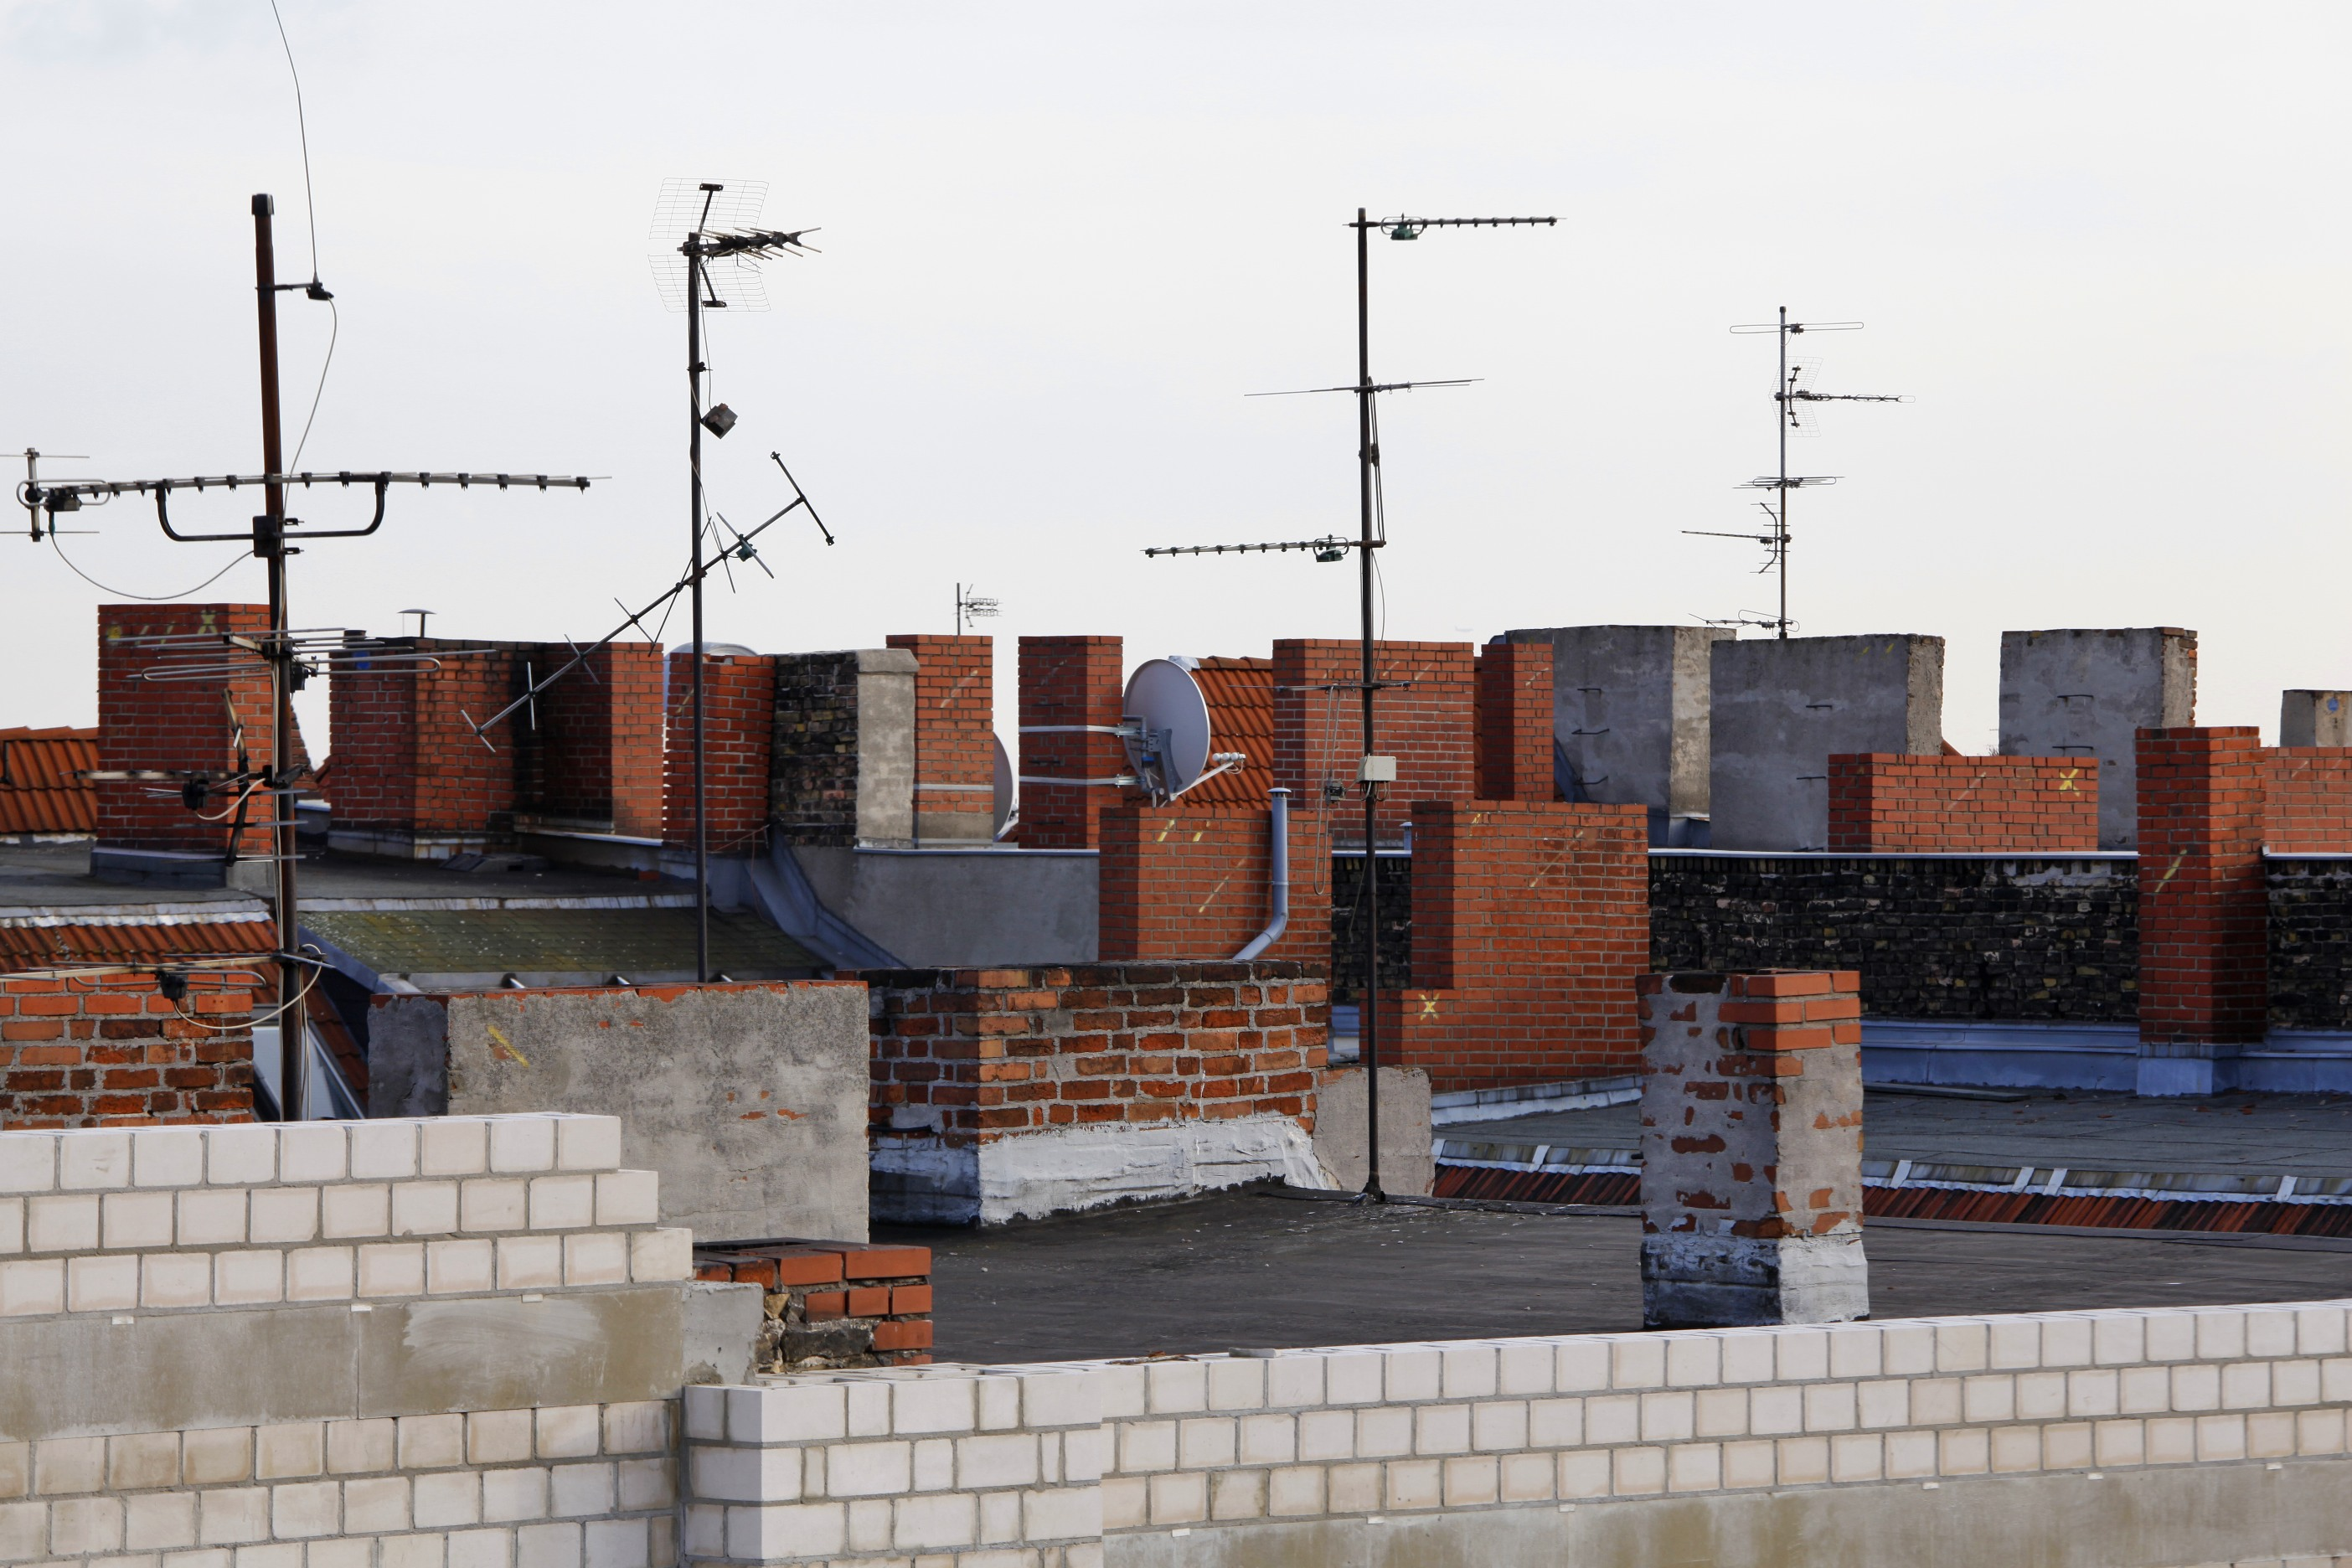 Rooftops Neukölln by Liz Eve, Liz Eve